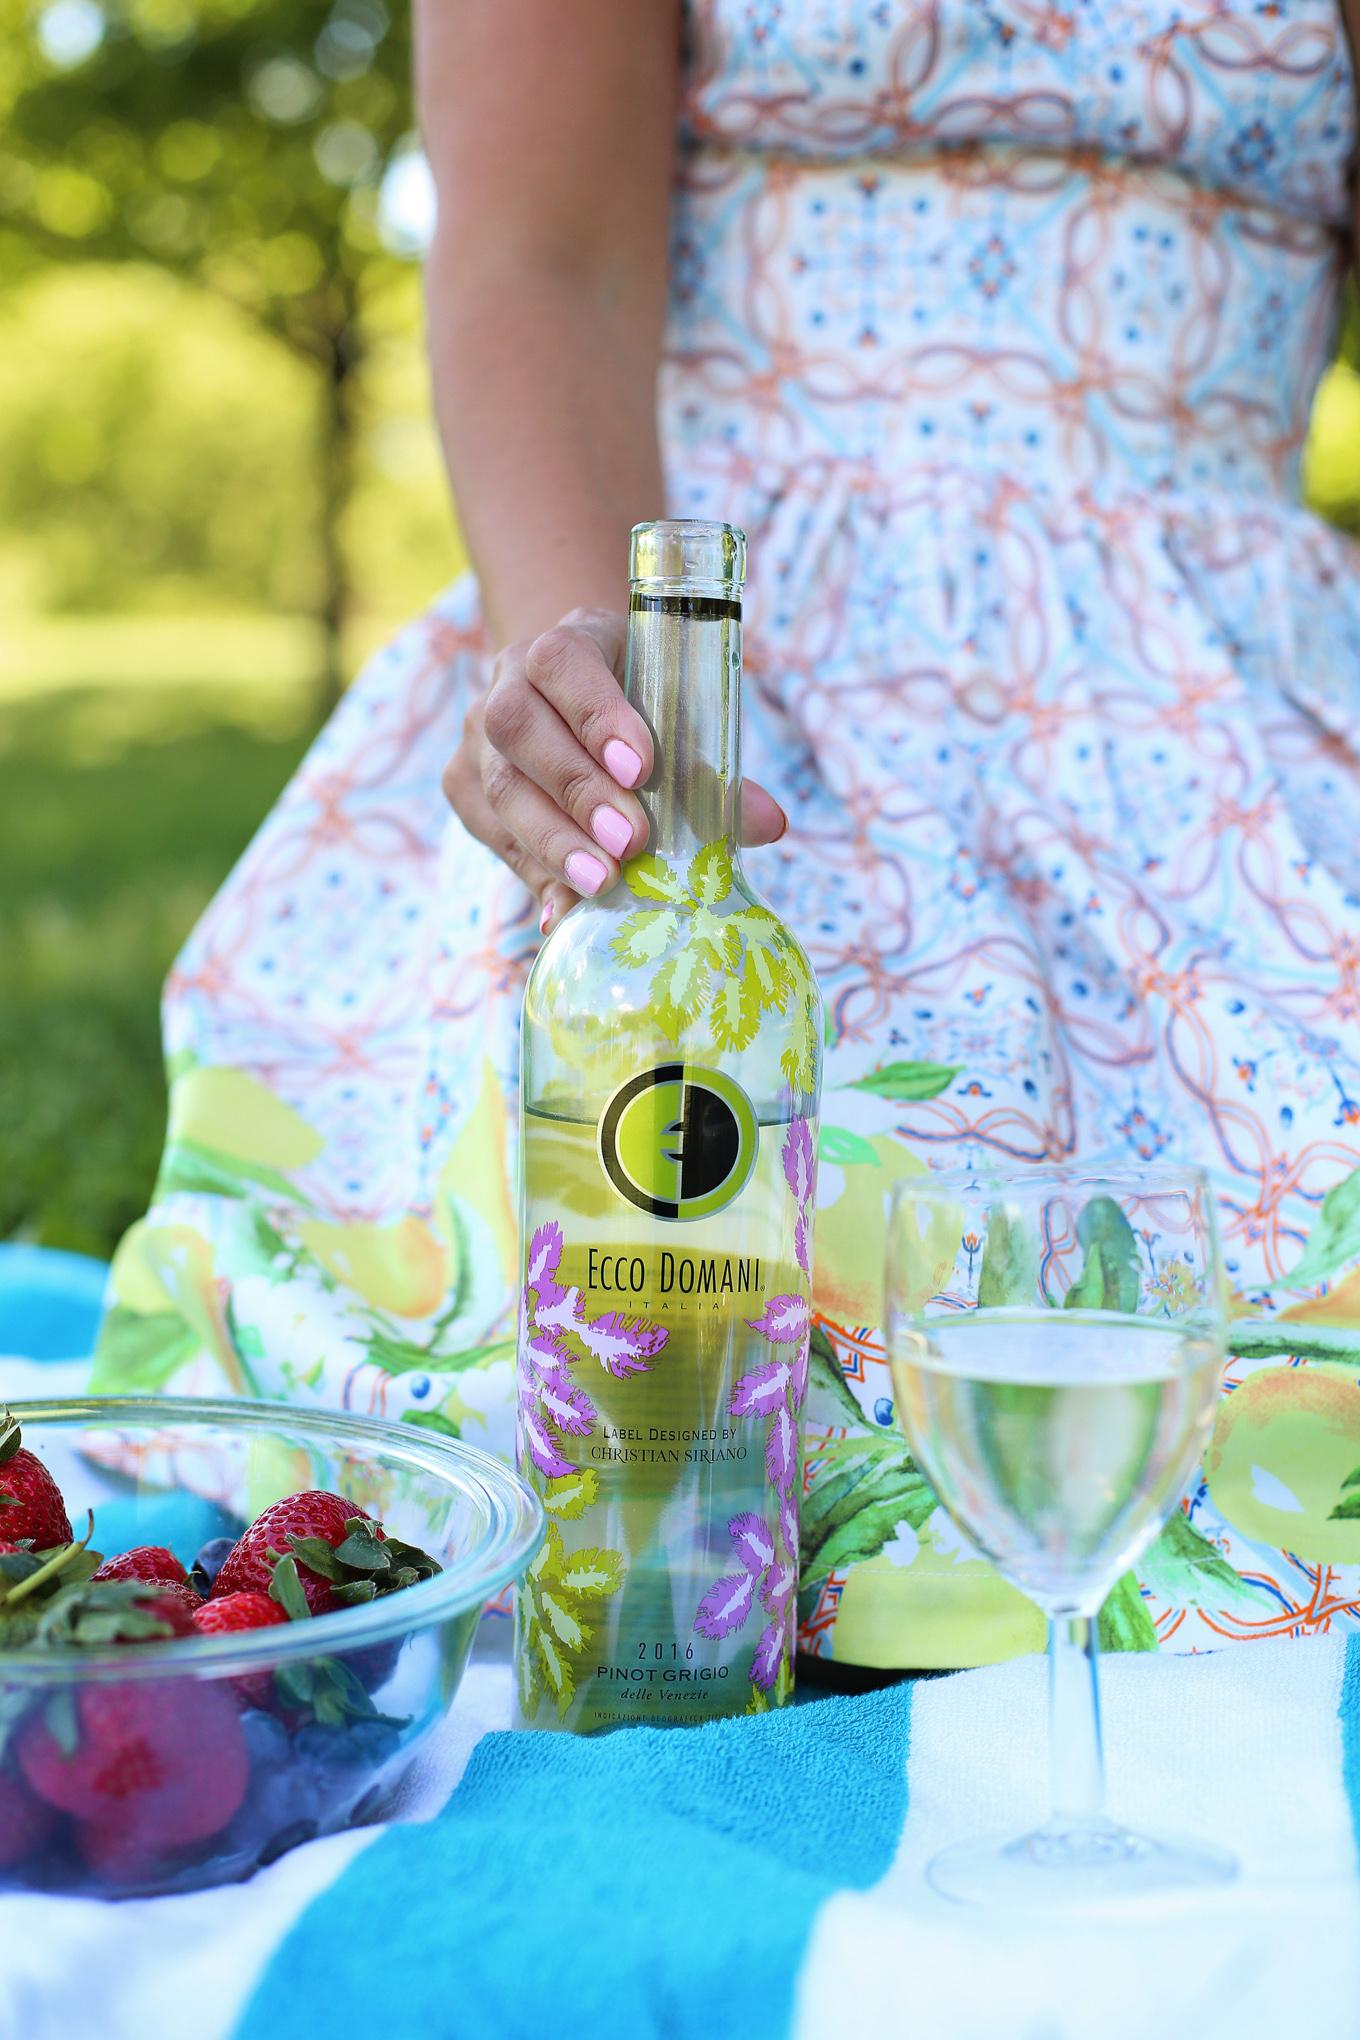 Ecco Domani x Christian Siriano Pinot Grigio + the cutest Lemon Print Dress - Lake Shore Lady